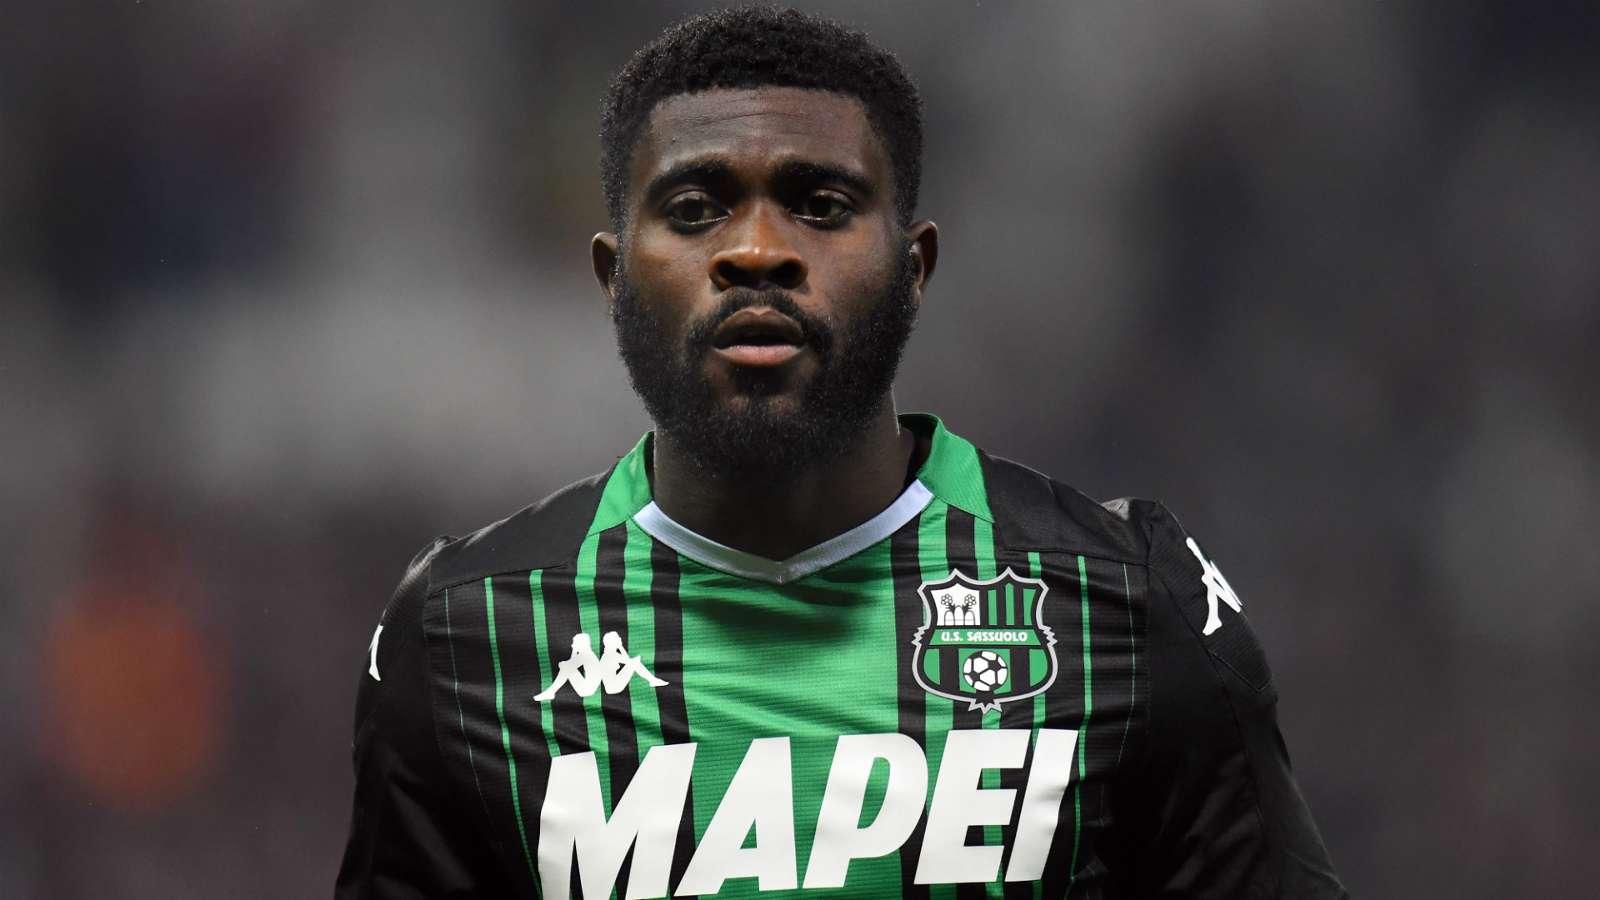 Boga muốn ở lại Serie A